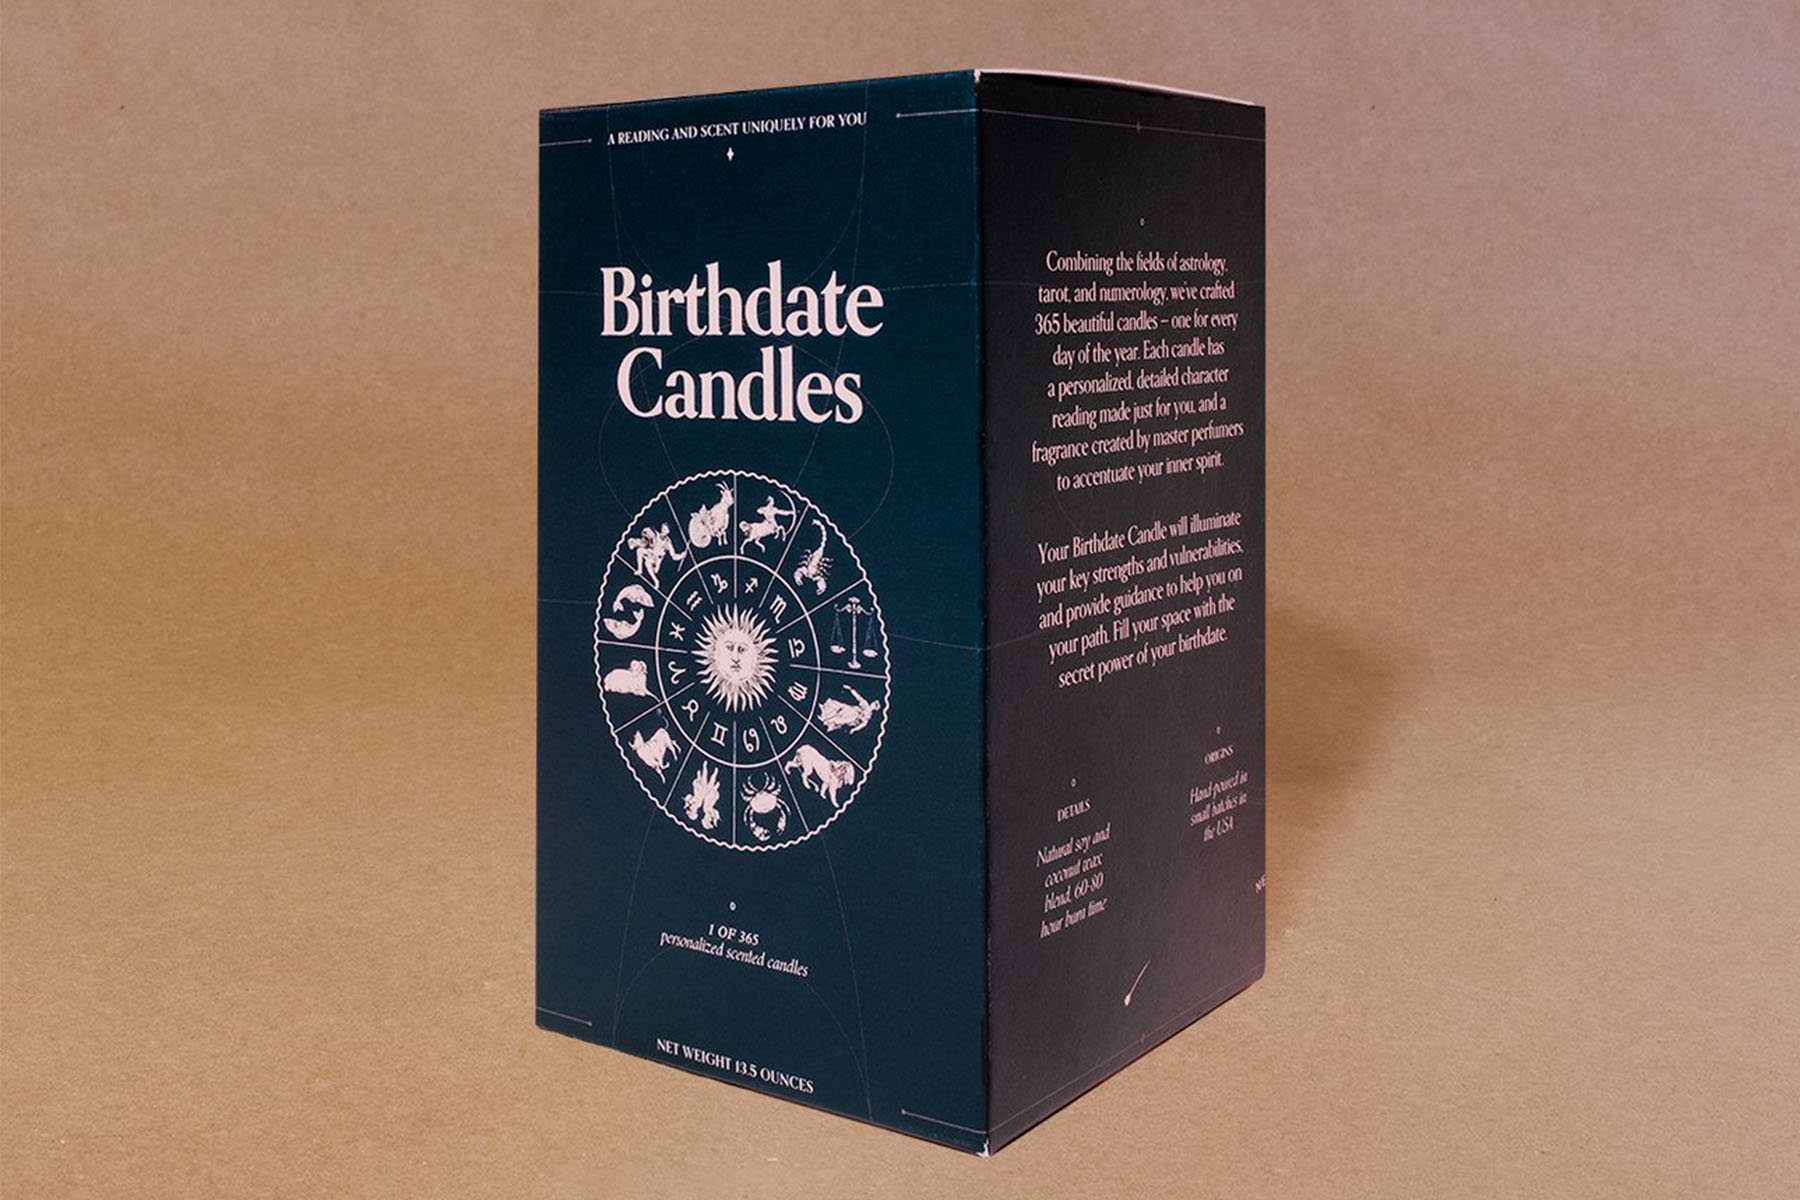 birthdate candles